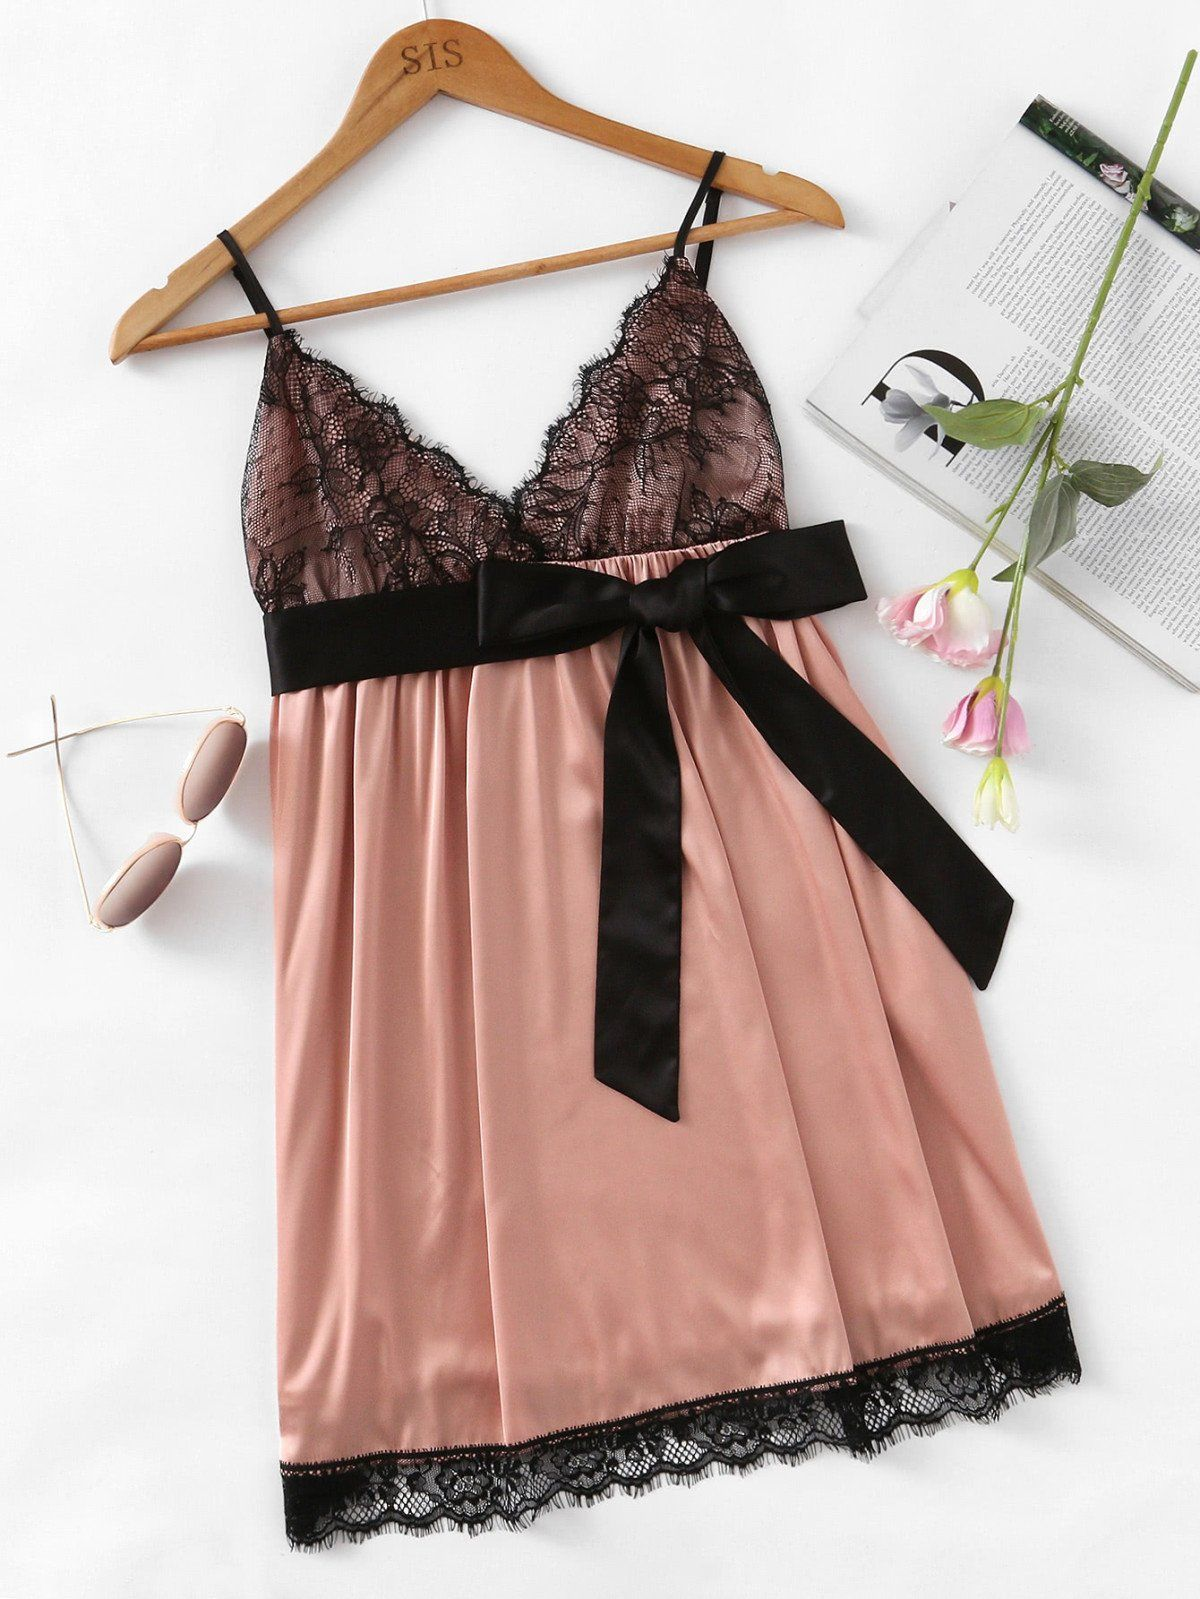 Lace dress nightwear  Eyelash Lace Detail Bow Waist Nightdress  Lace detail Loungewear